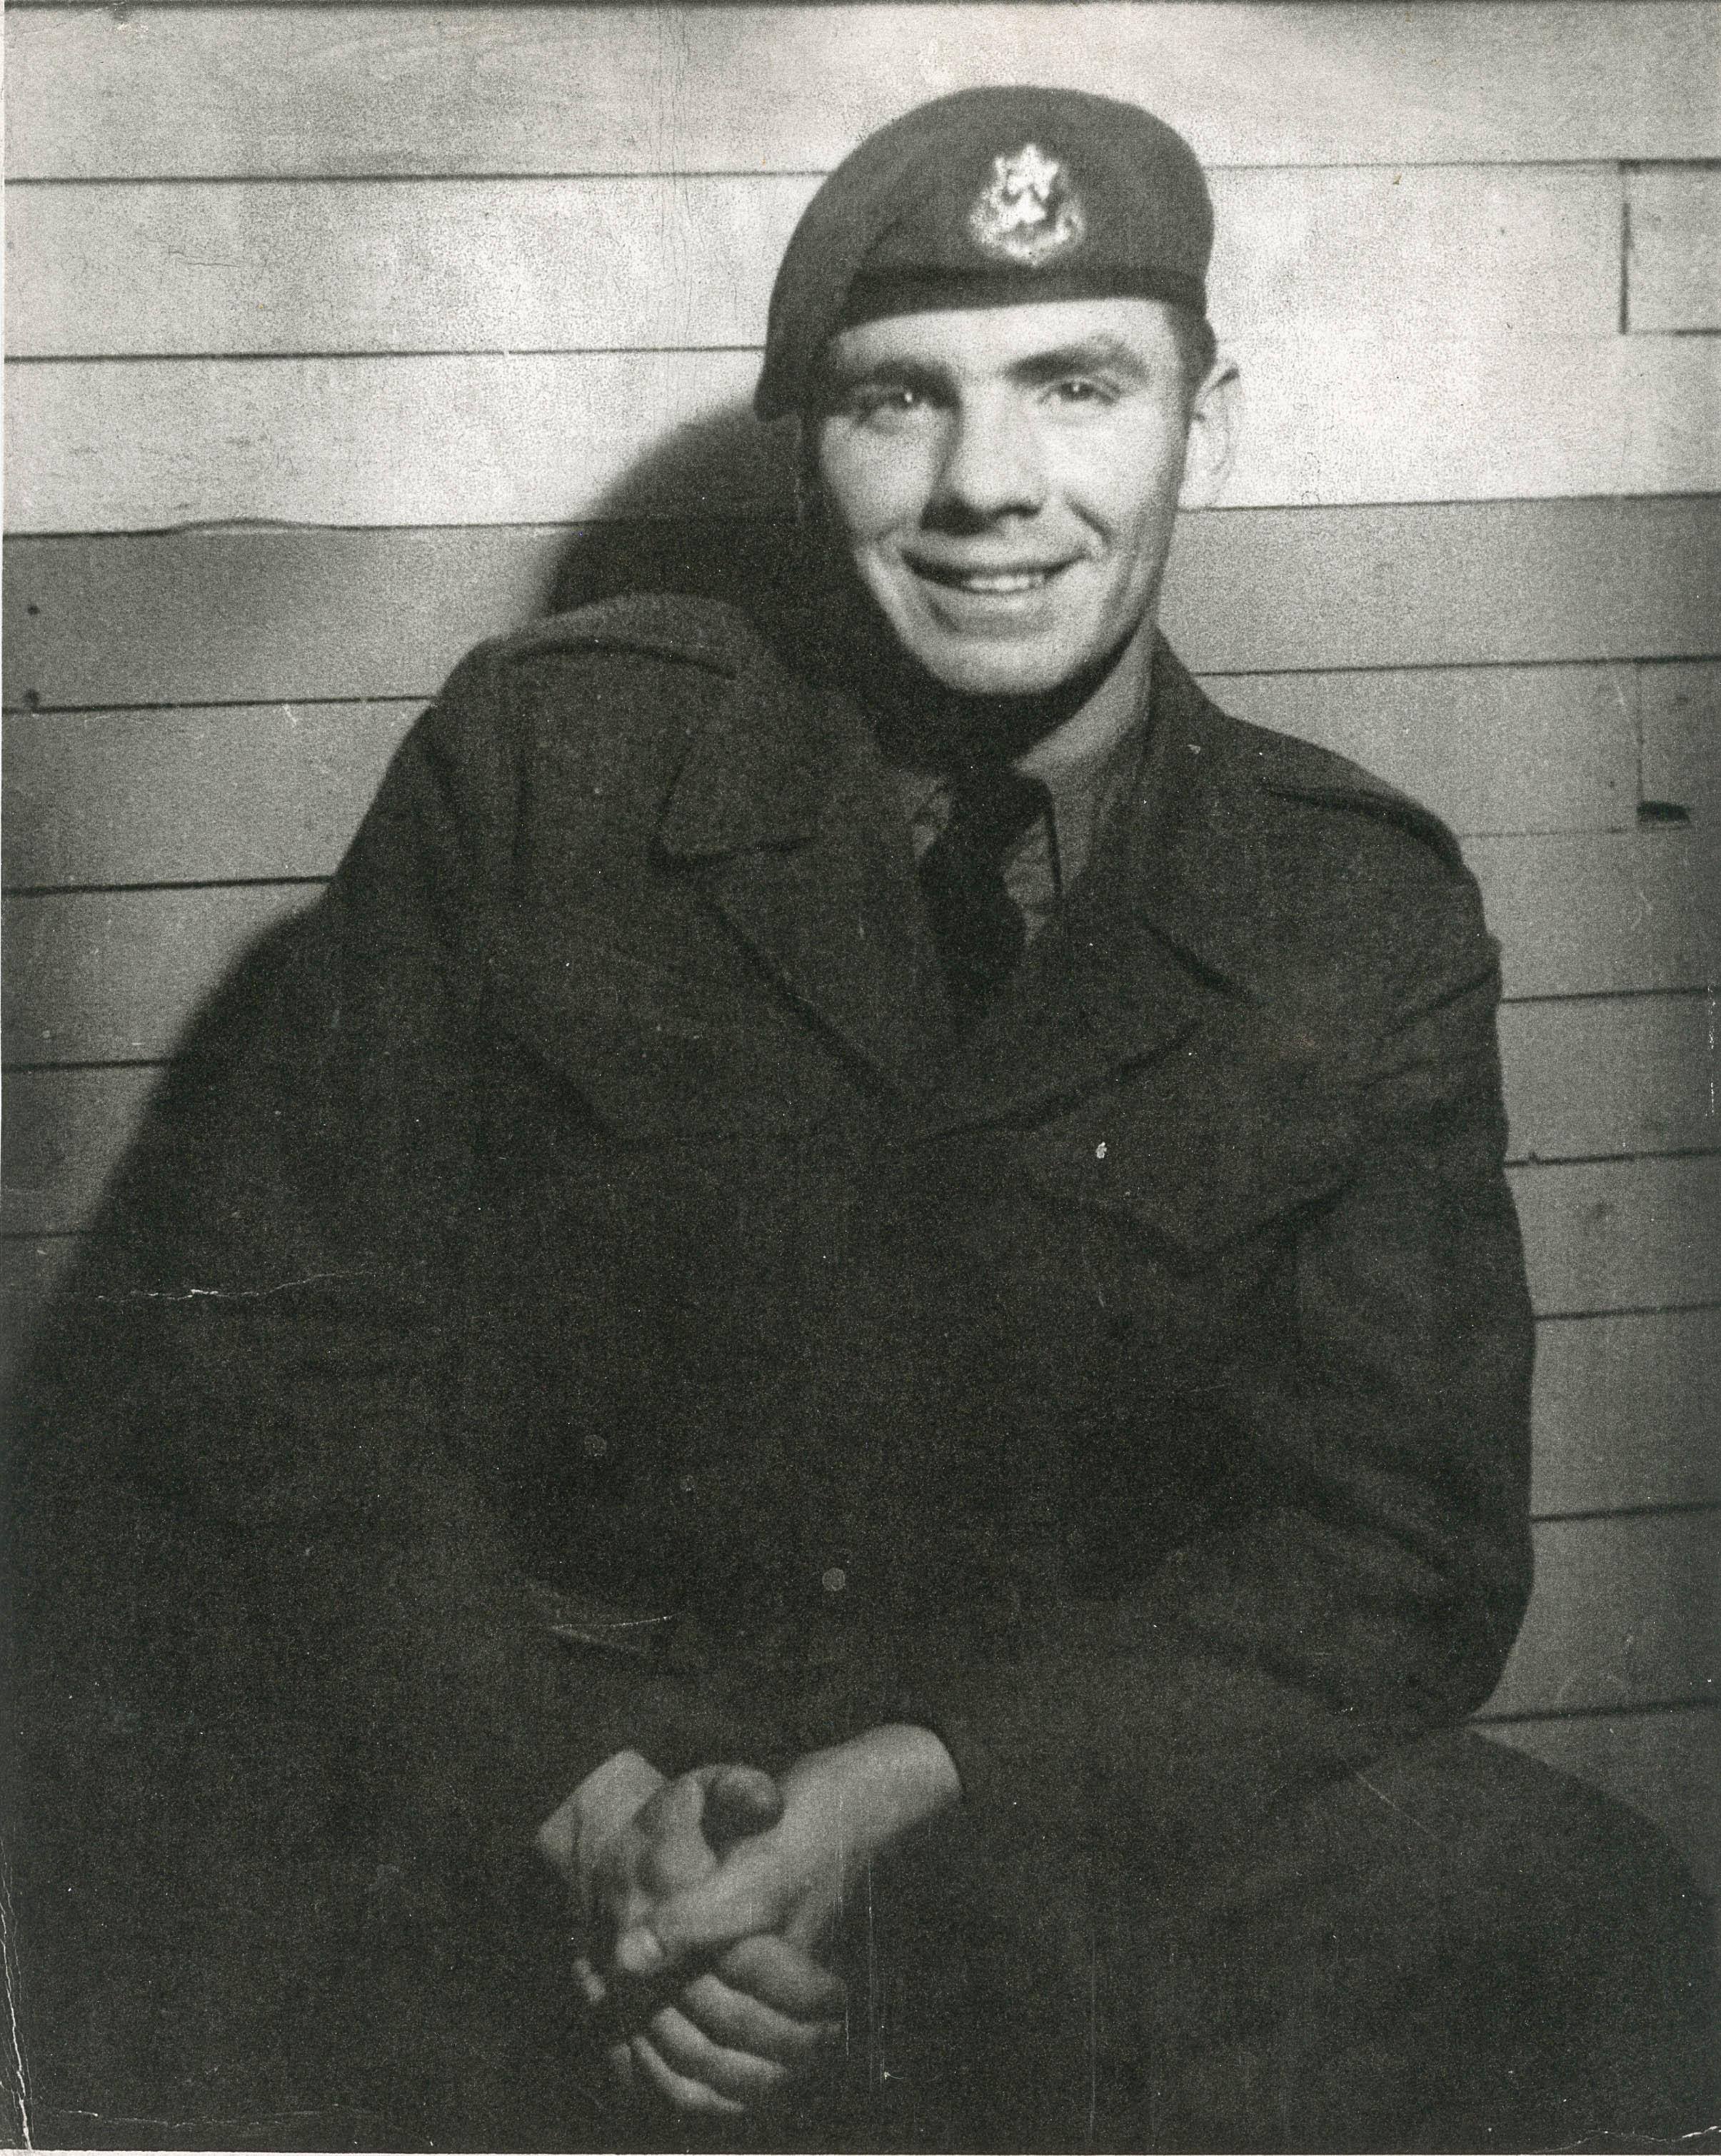 Allison Furlotte, Korean War veteran